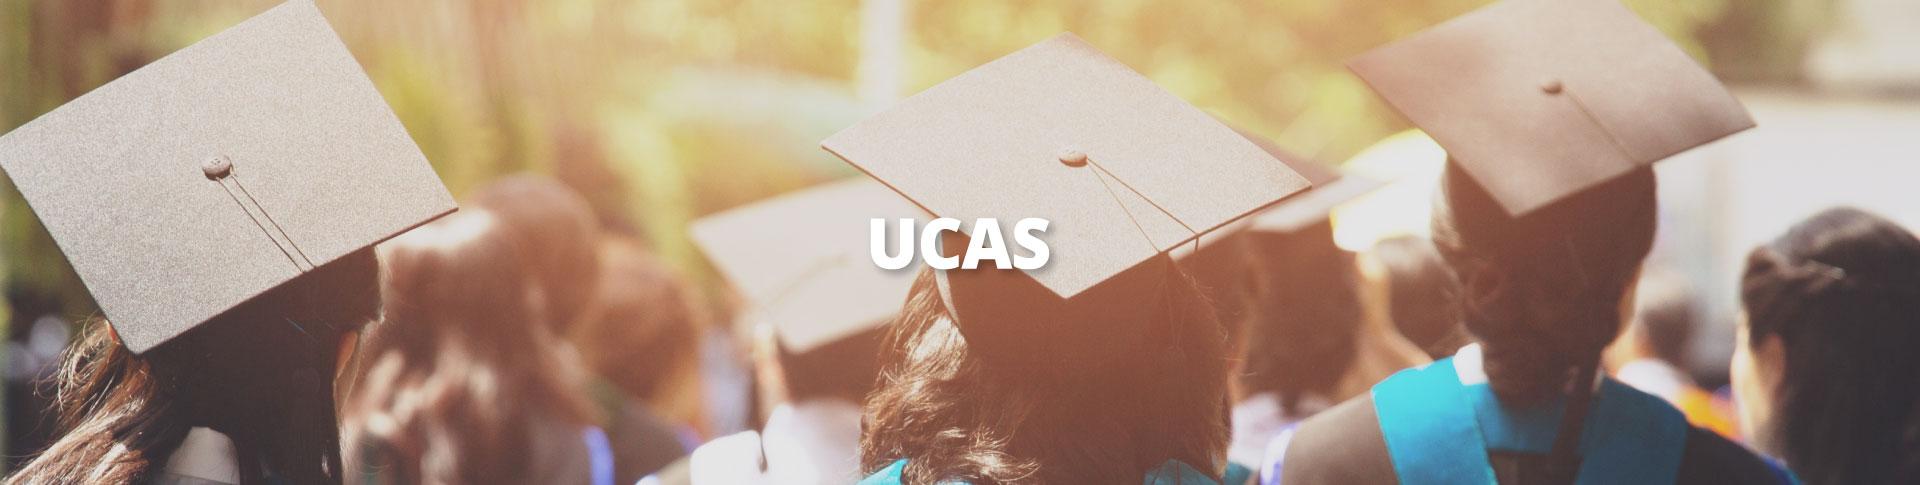 UCAS Centre